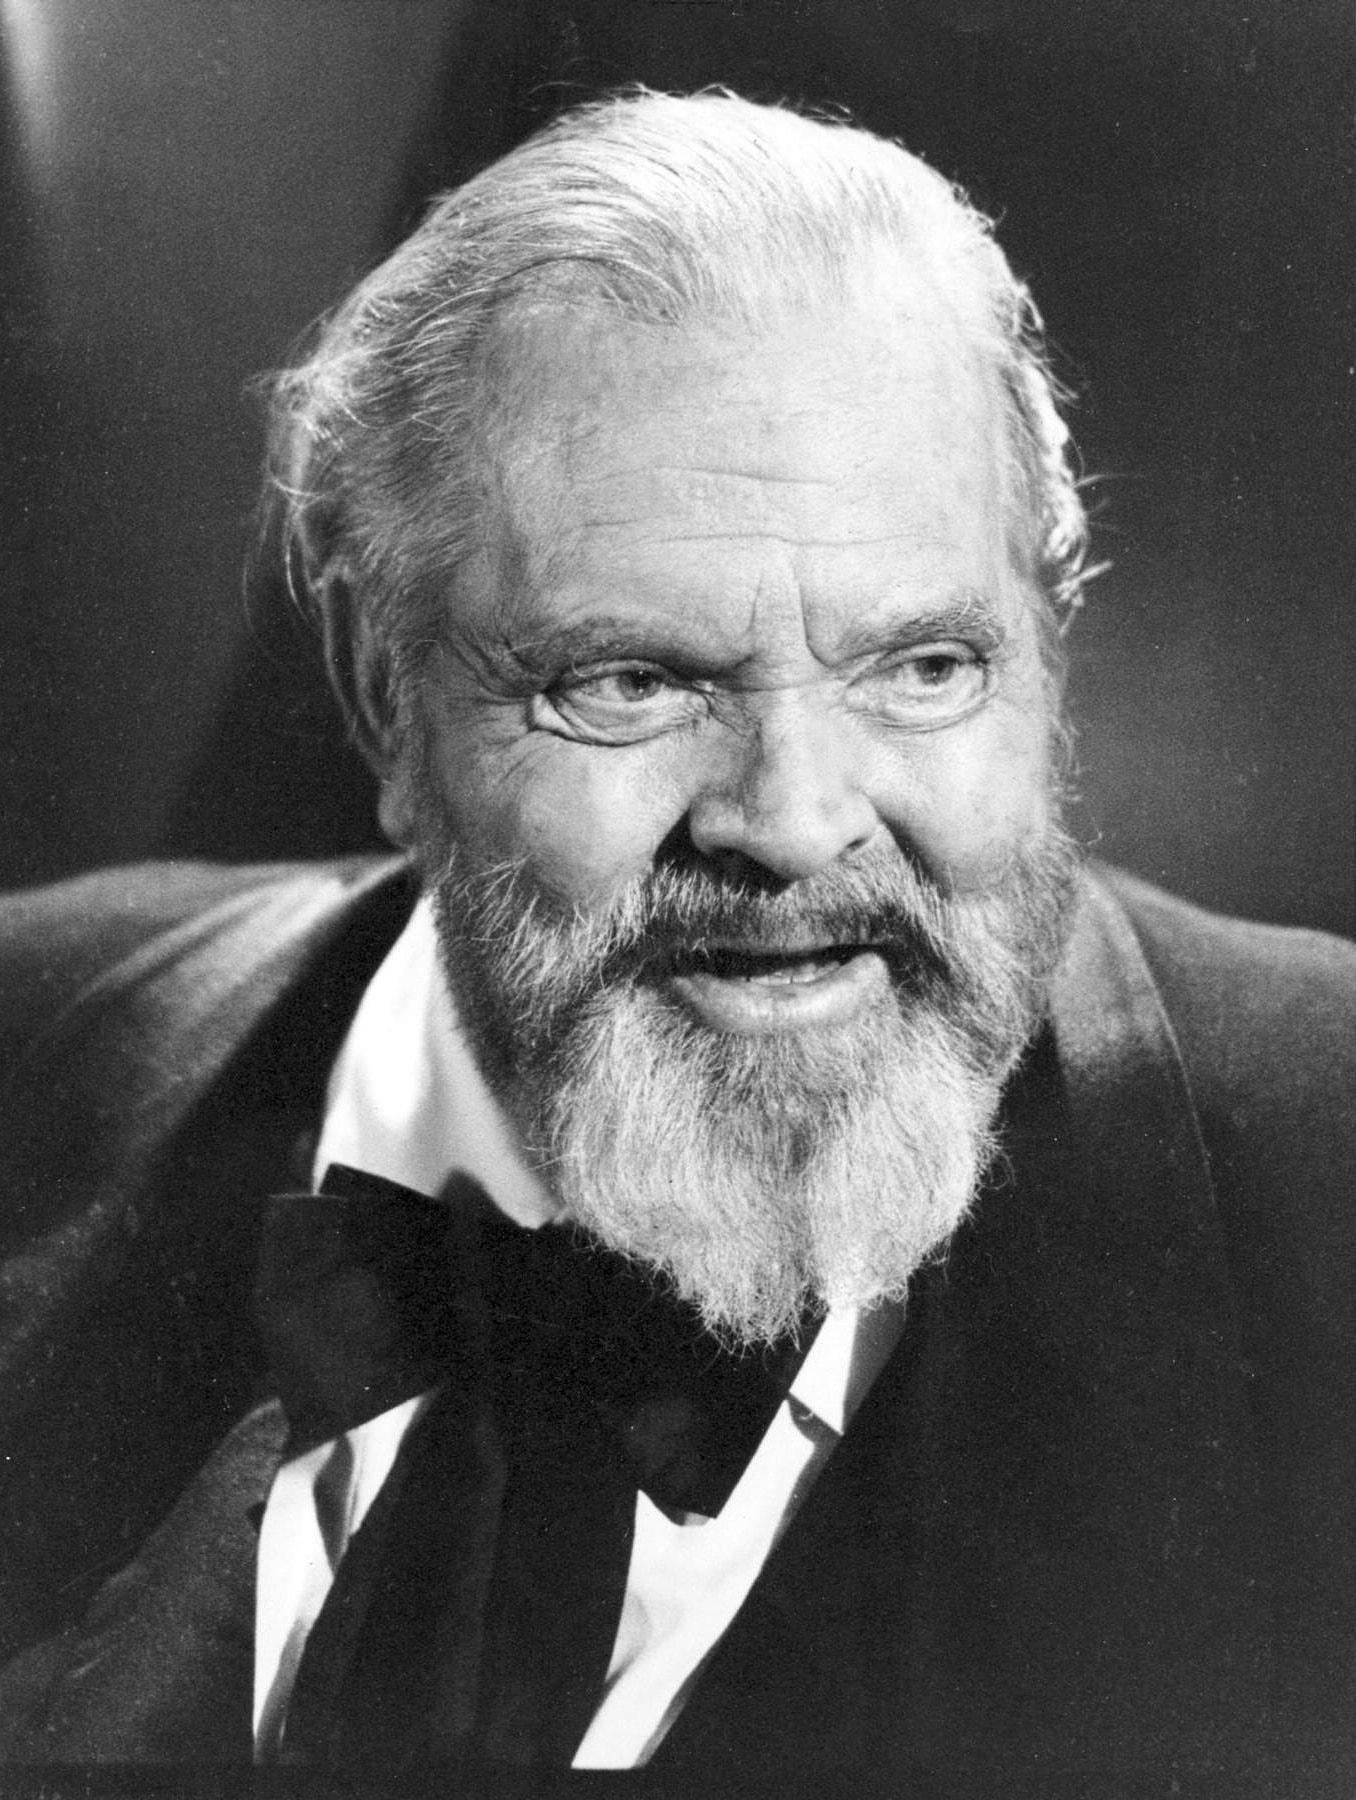 Orson Welles Backgrounds